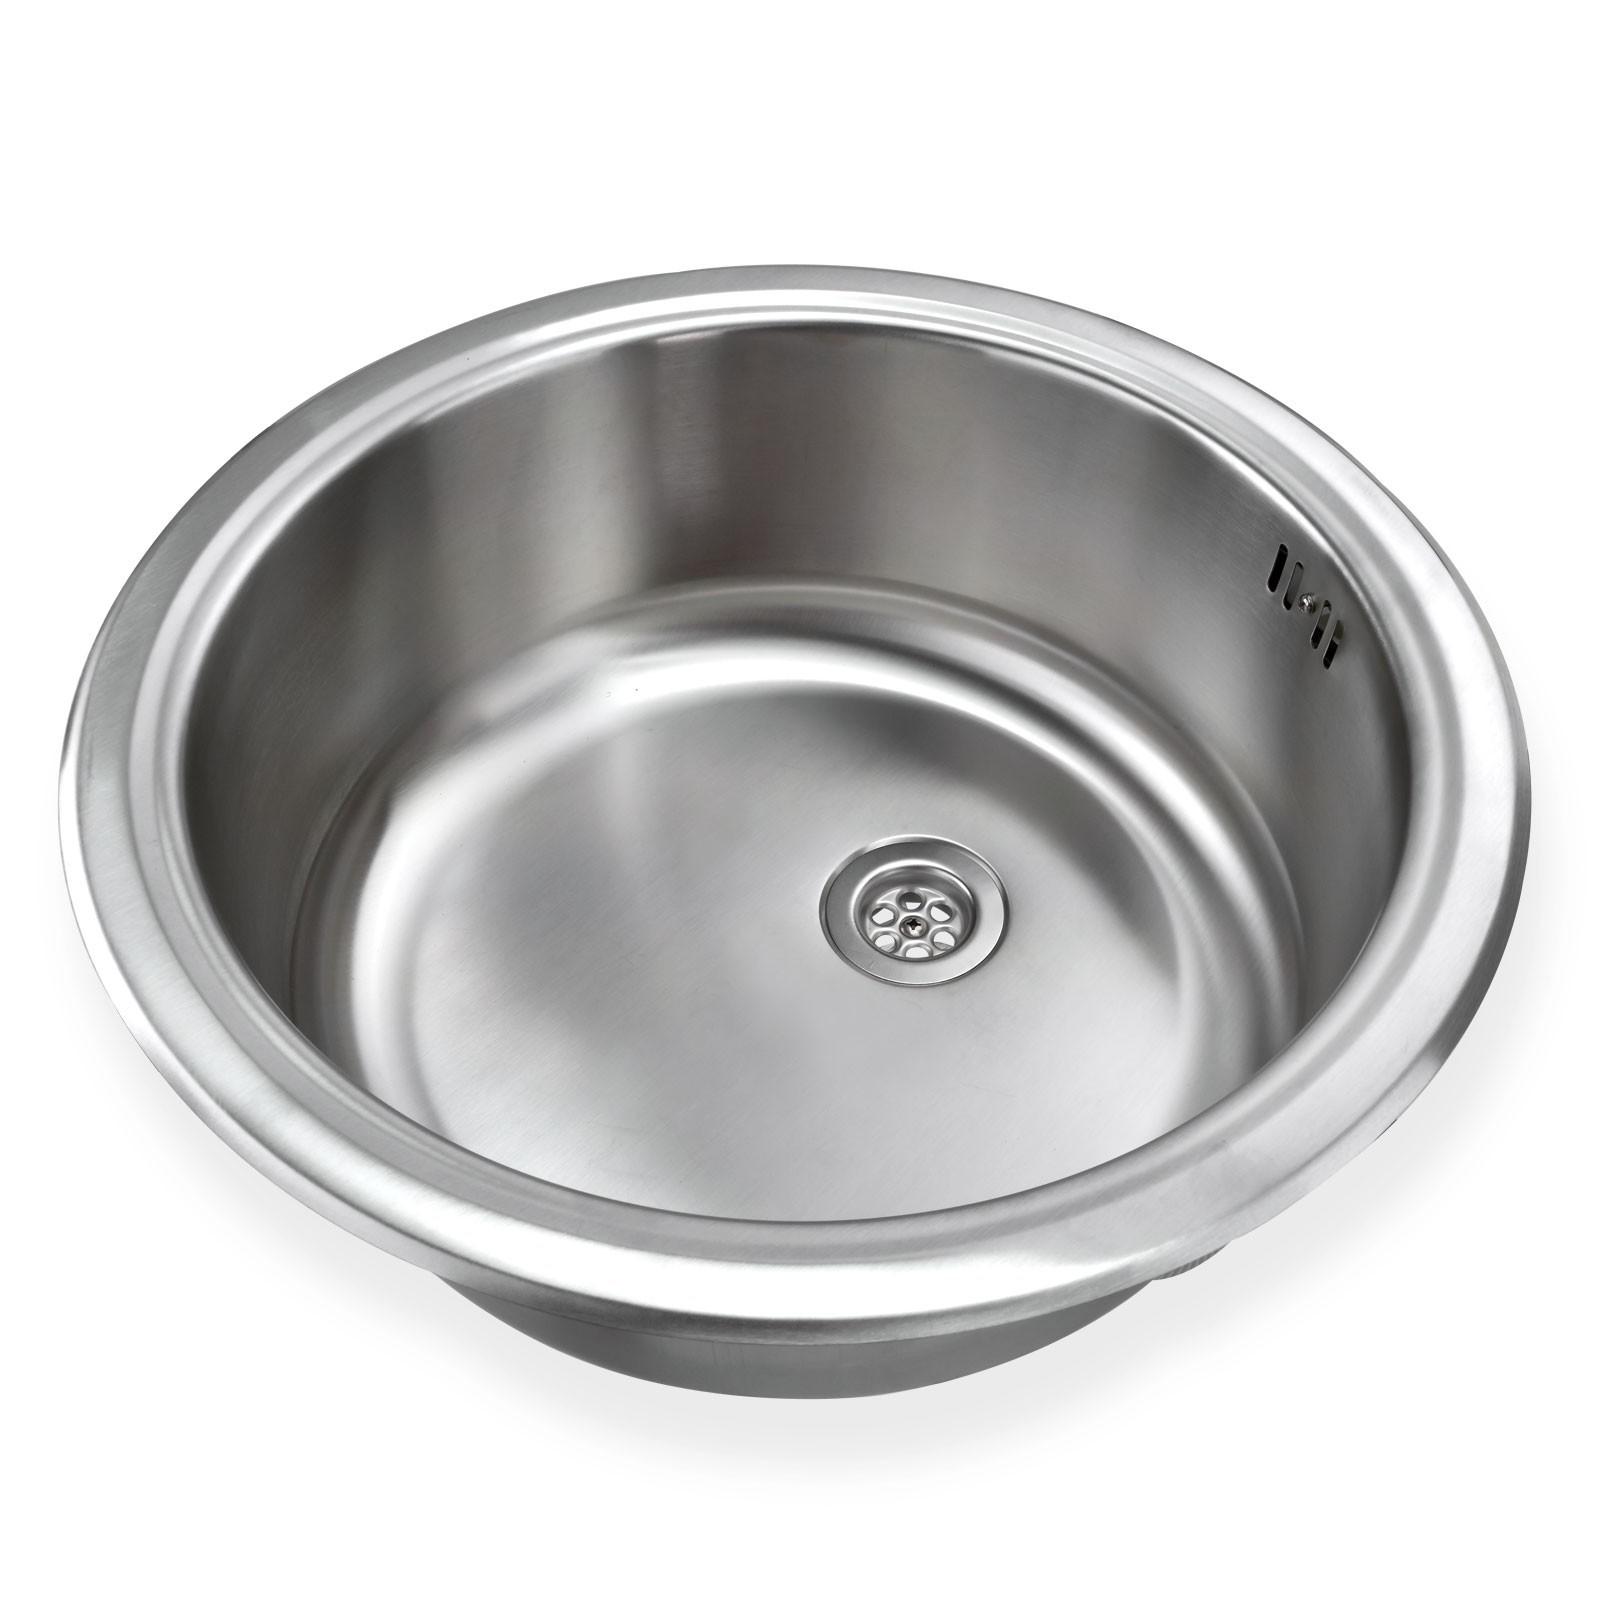 Full Size of Küche Waschbecken Abfluss Verstopft Küche Waschbecken Material Küche Waschbecken Verstopft Küche Waschbecken Entkalken Küche Küche Waschbecken